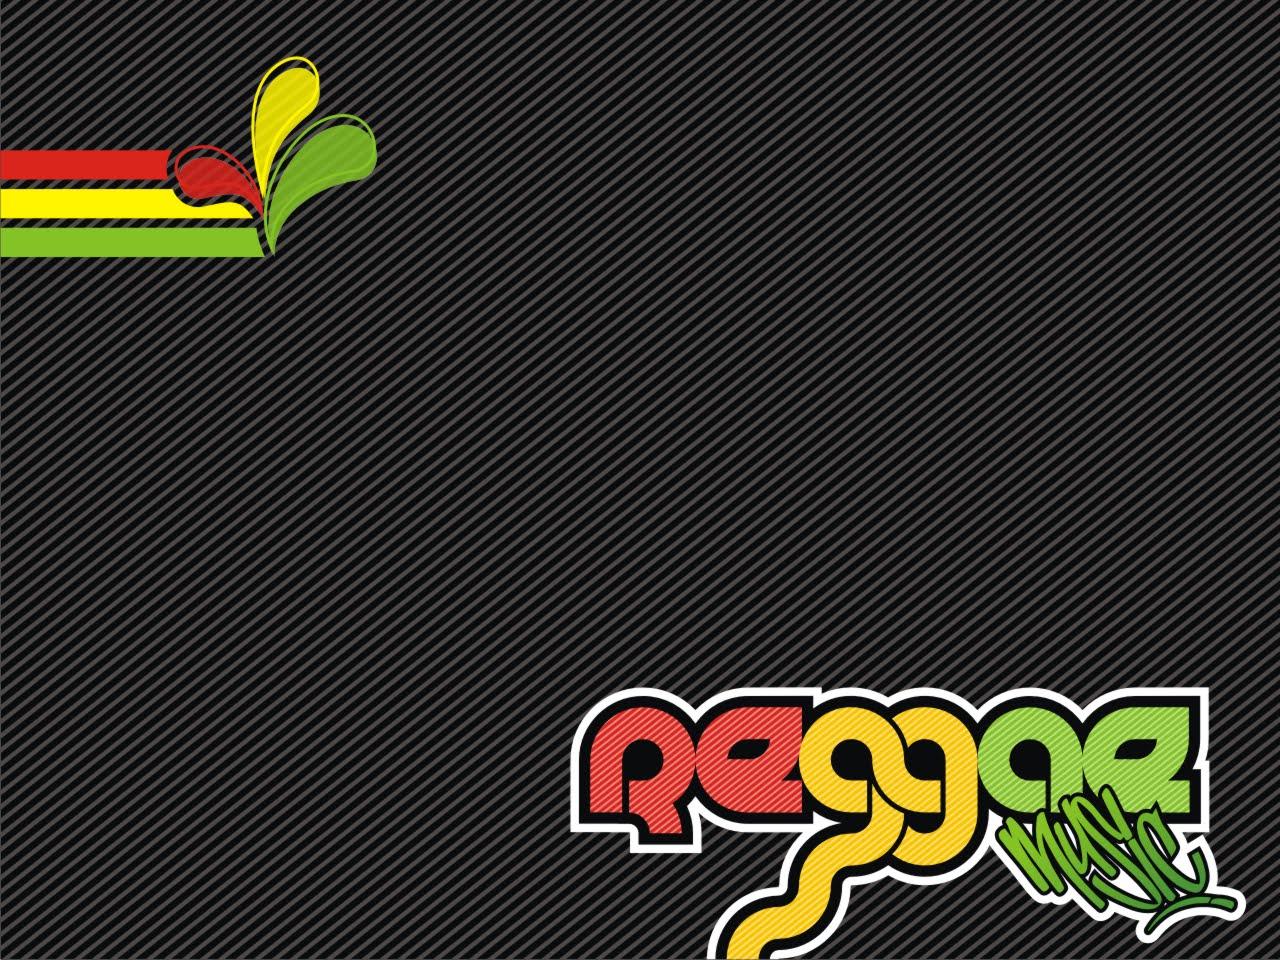 http://3.bp.blogspot.com/_vh9dzRU1ep0/TI6fb1uf7xI/AAAAAAAALS4/BMt-smxpKXM/s1600/reggae_by_romeeSTRL.jpg